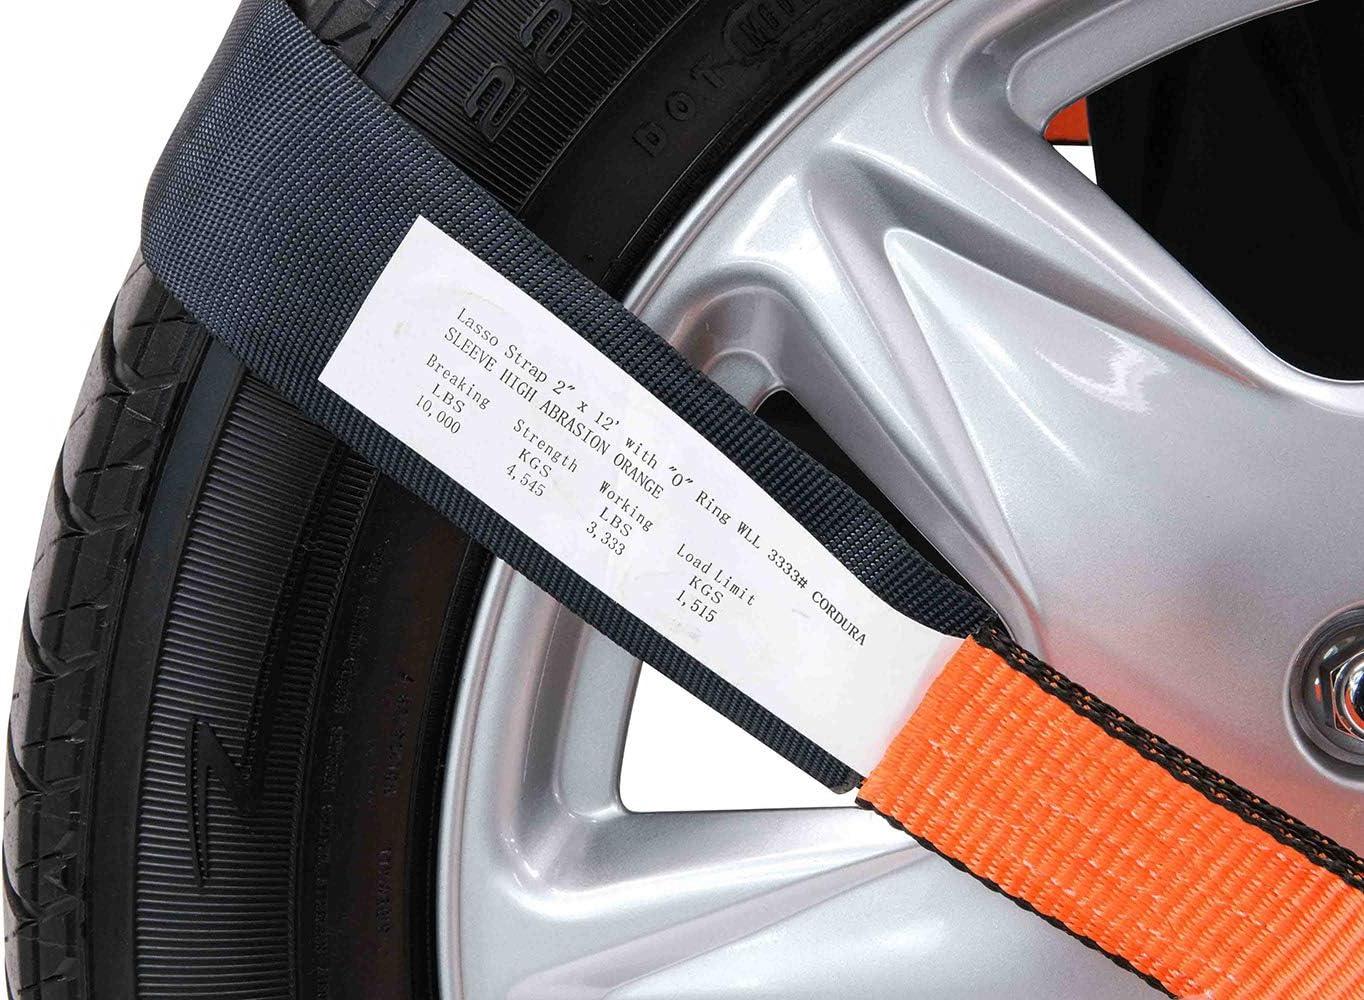 High Abrasion Orange Mytee Products 2 x 12 Winch Lasso Strap w//O Ring 3333 lbs WL Cordura Sleeve 4 - Pack, High Abrasion Orange